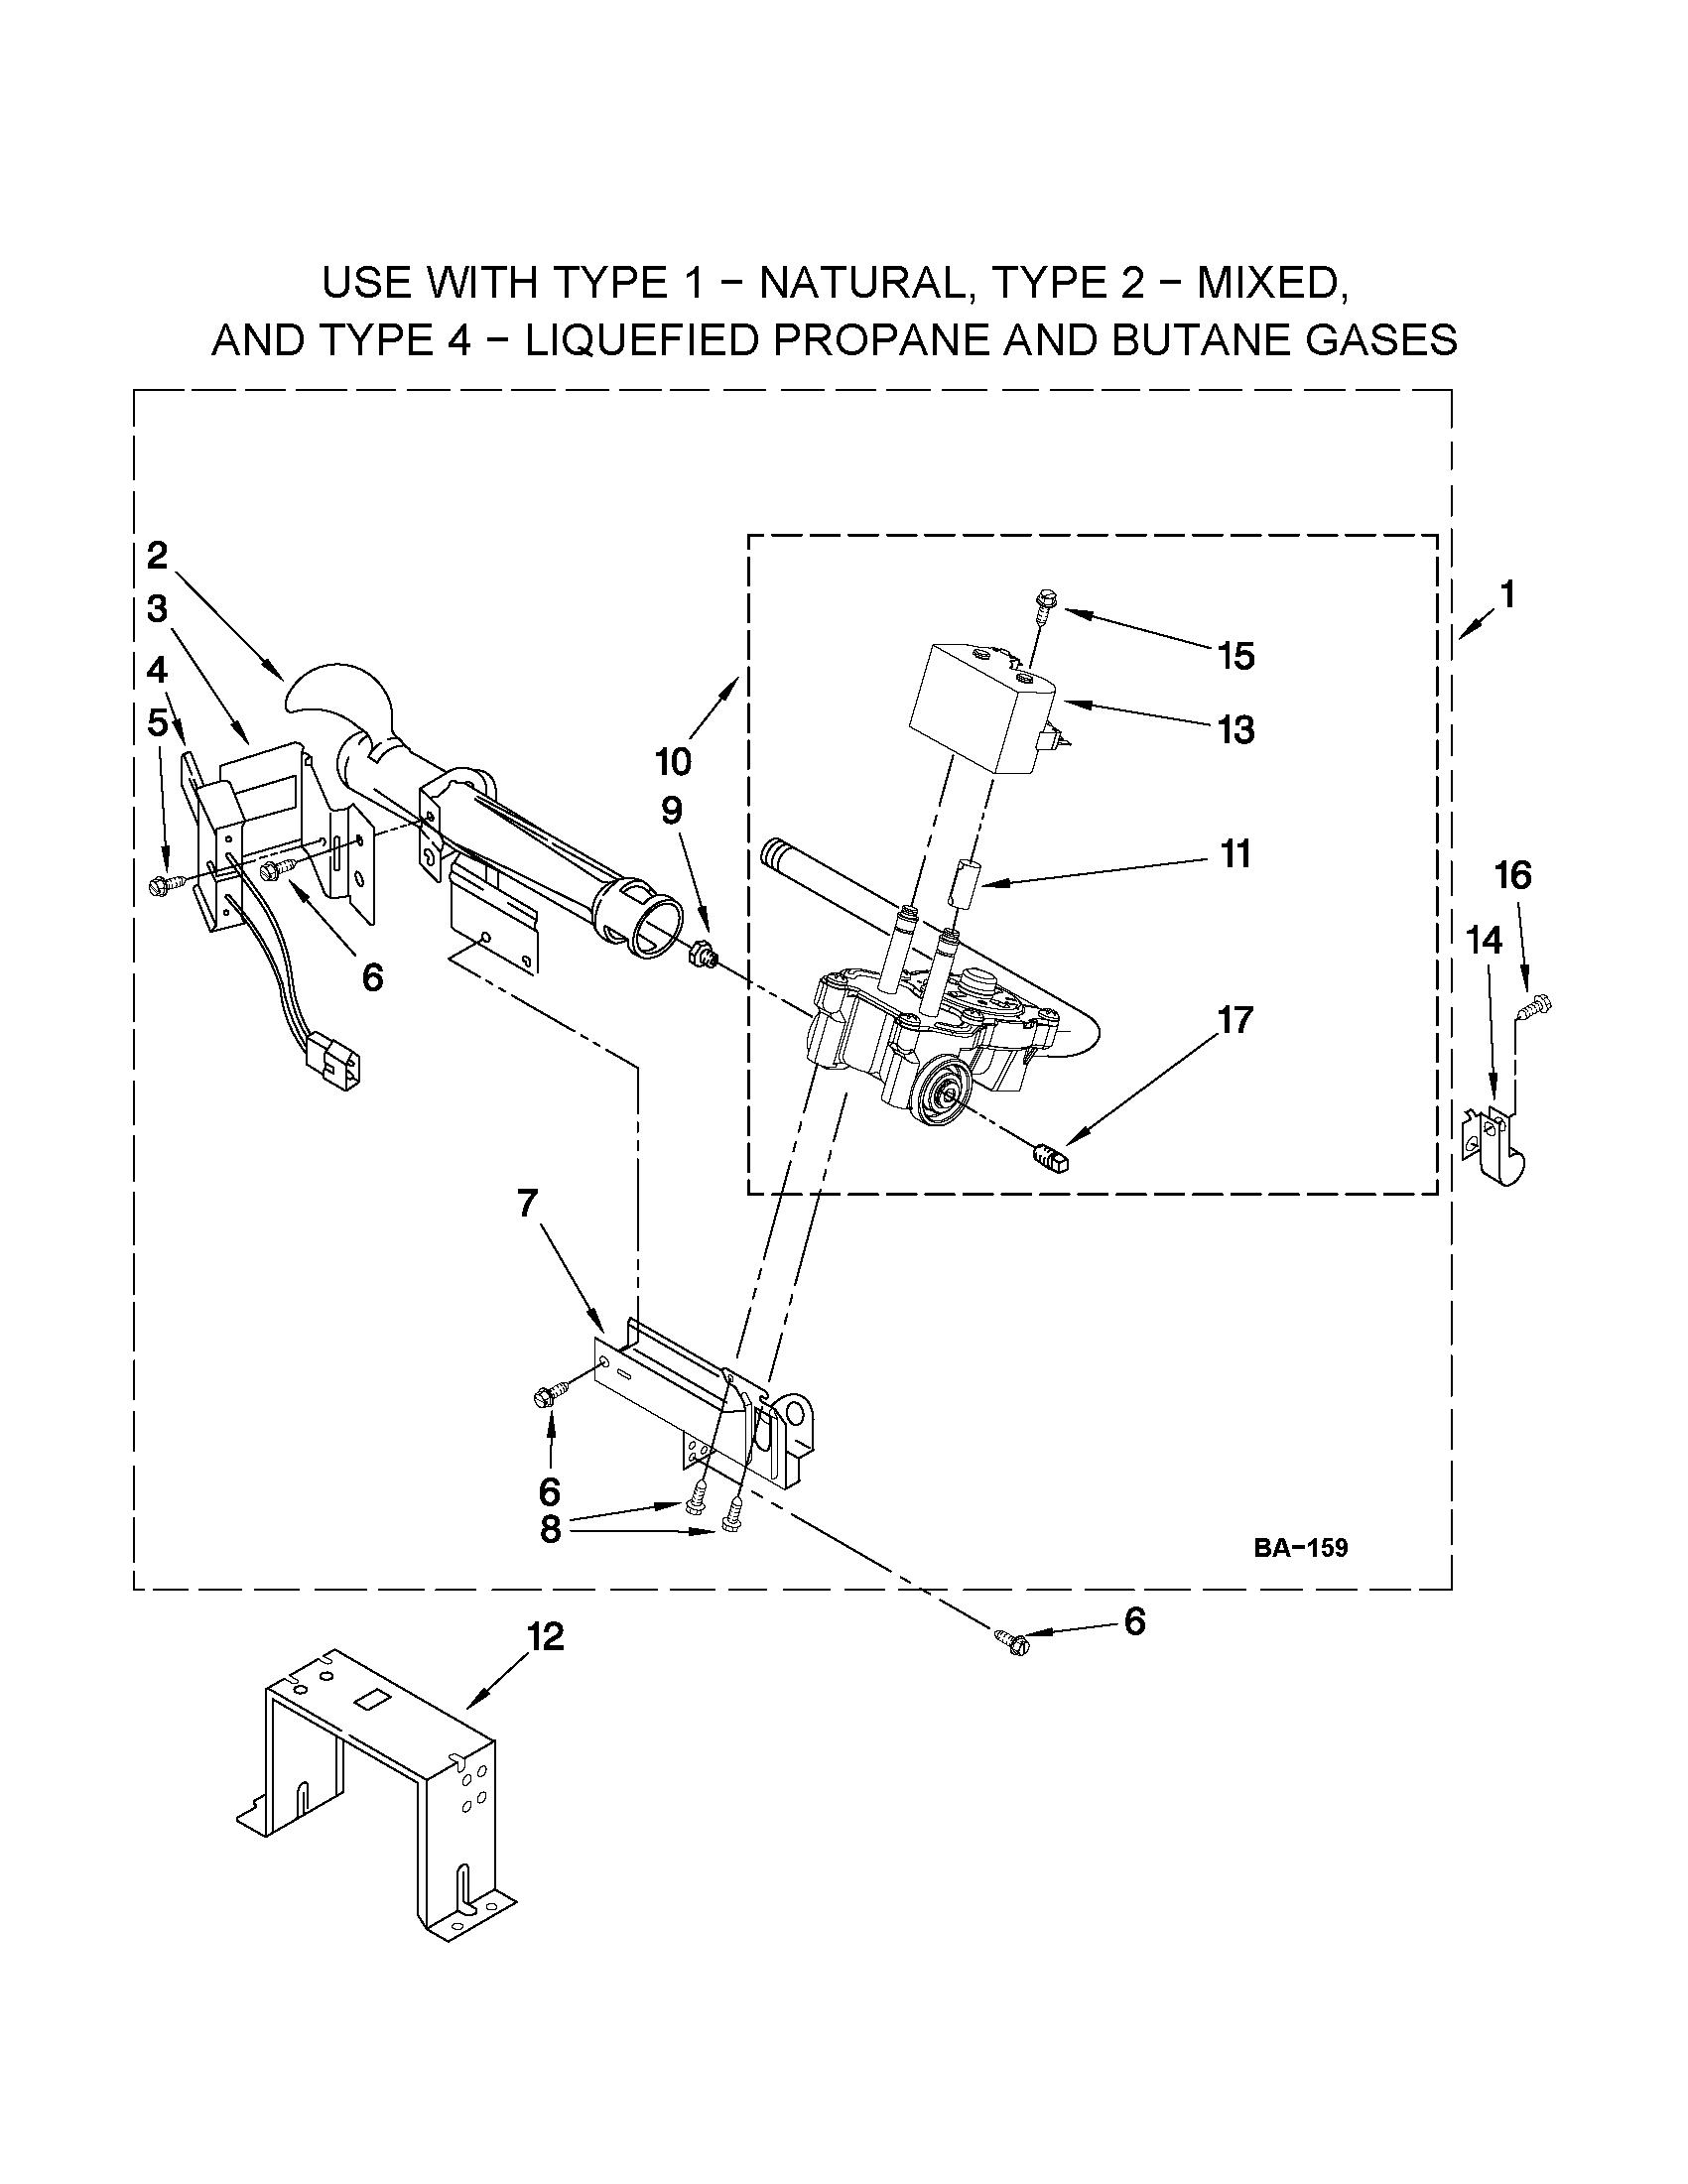 hight resolution of whirlpool wgd9050xw1 w10293911 burner assembly diagram